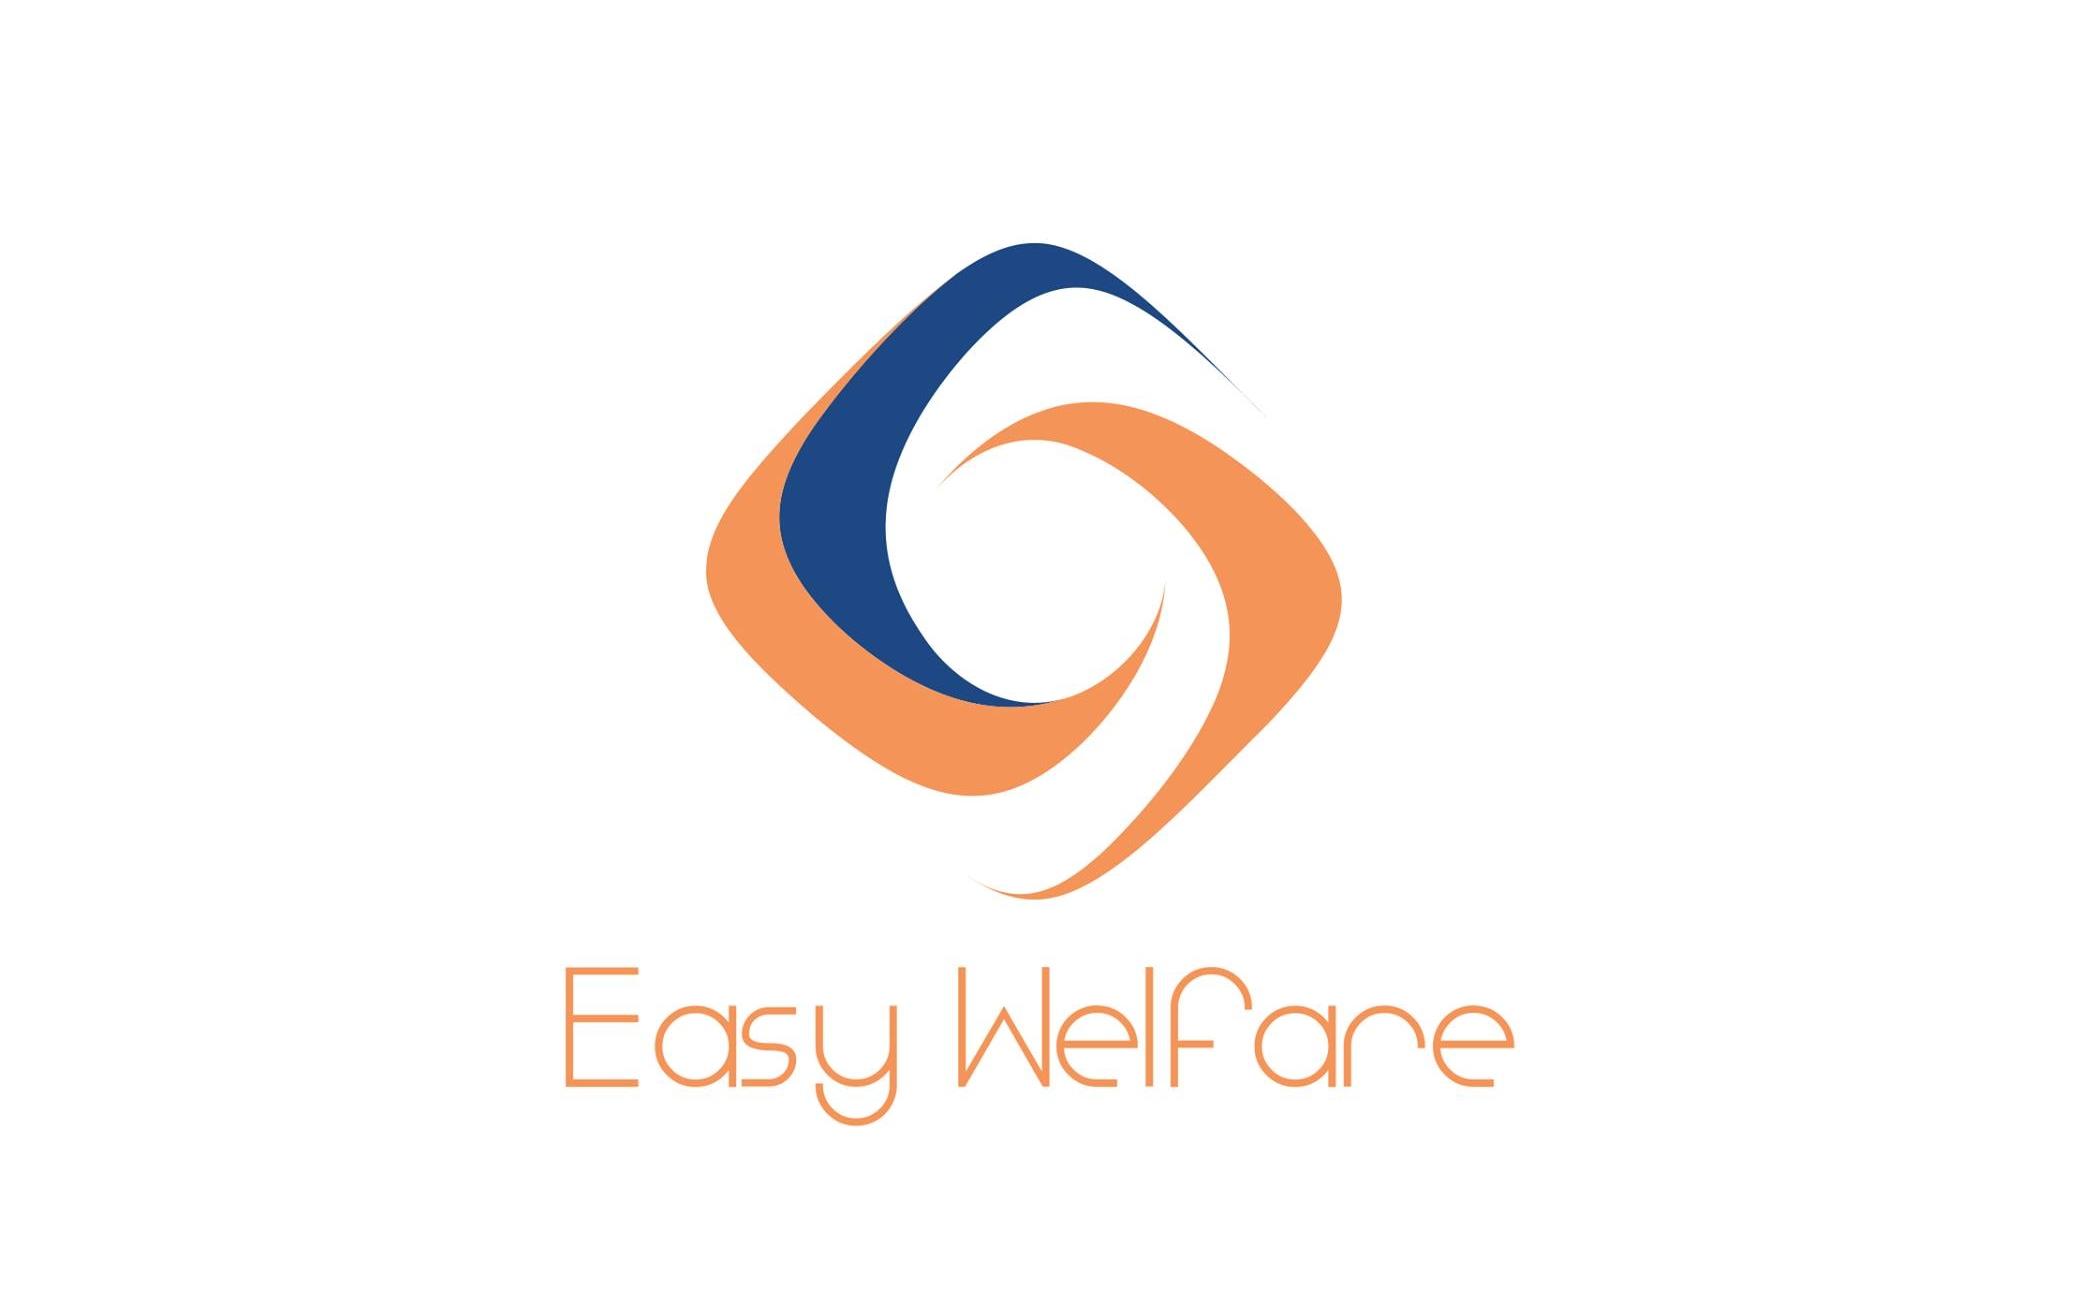 Easy Welfare Quadrato